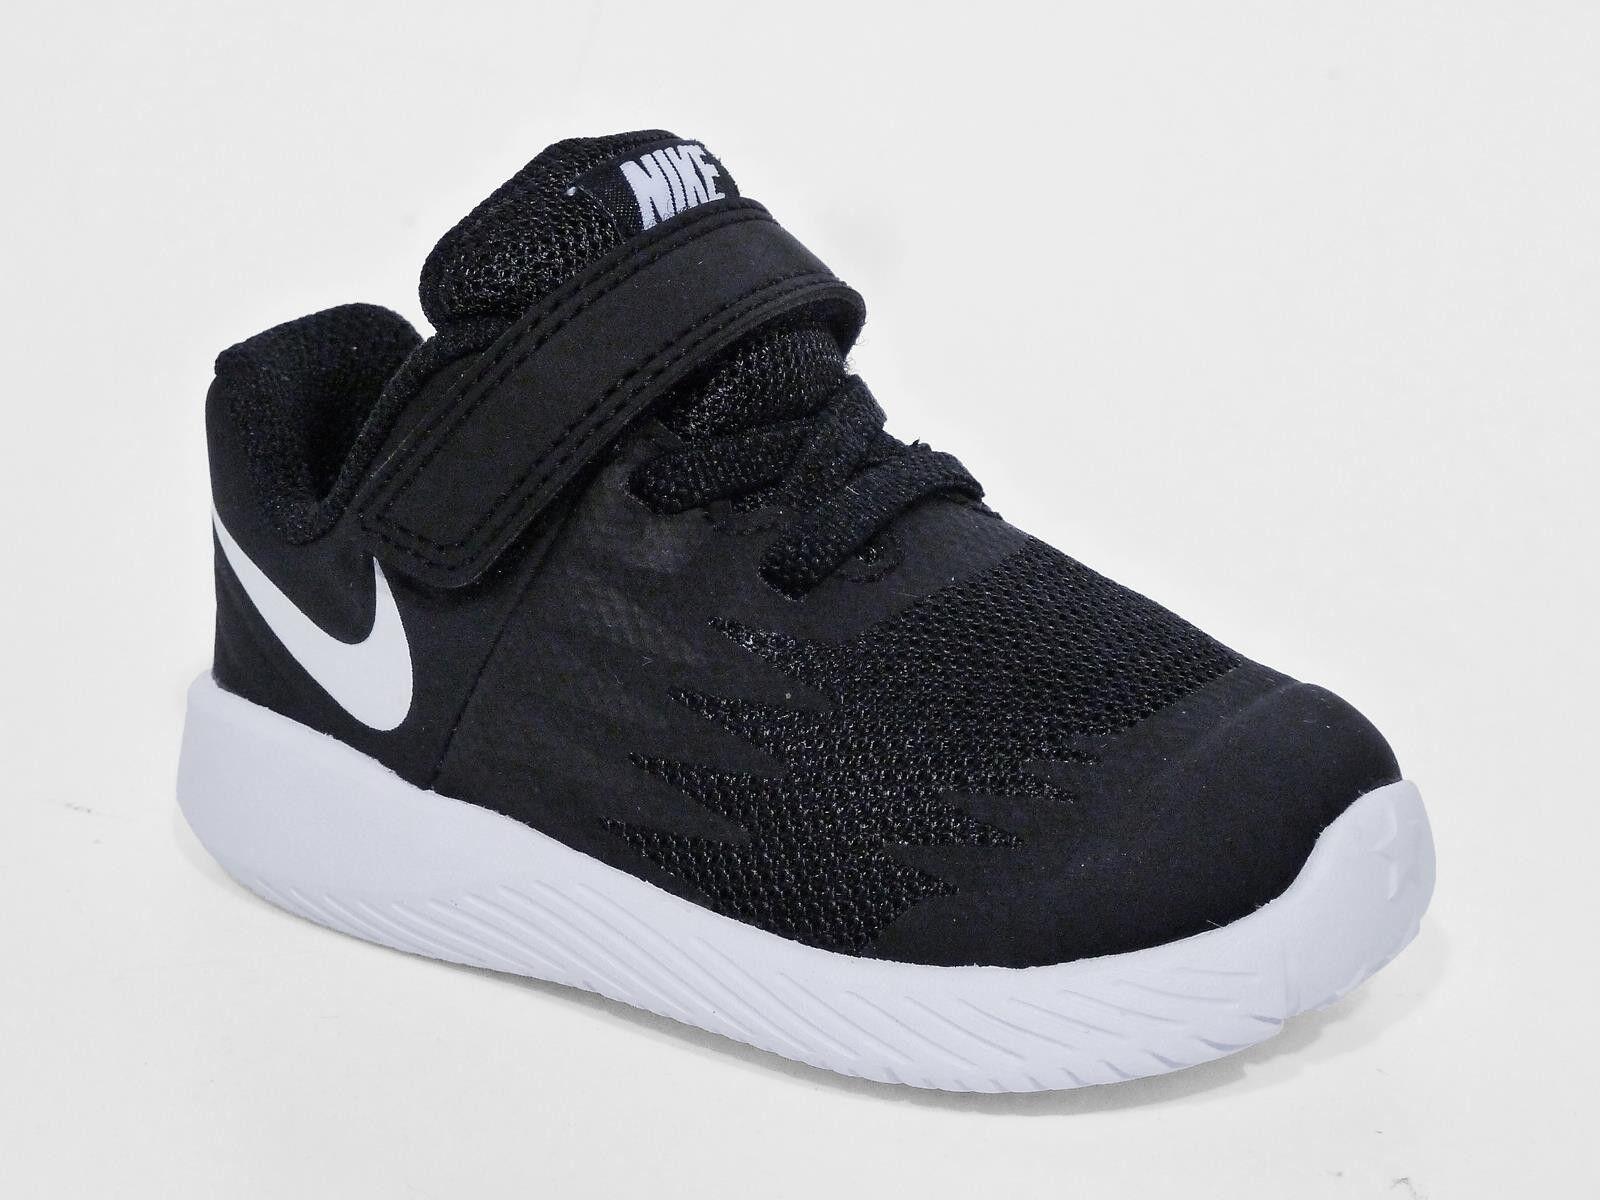 newest bac0b cd012 Nike Star Runner TDV Black White Toddler Infant Baby Shoes Sneakers ...